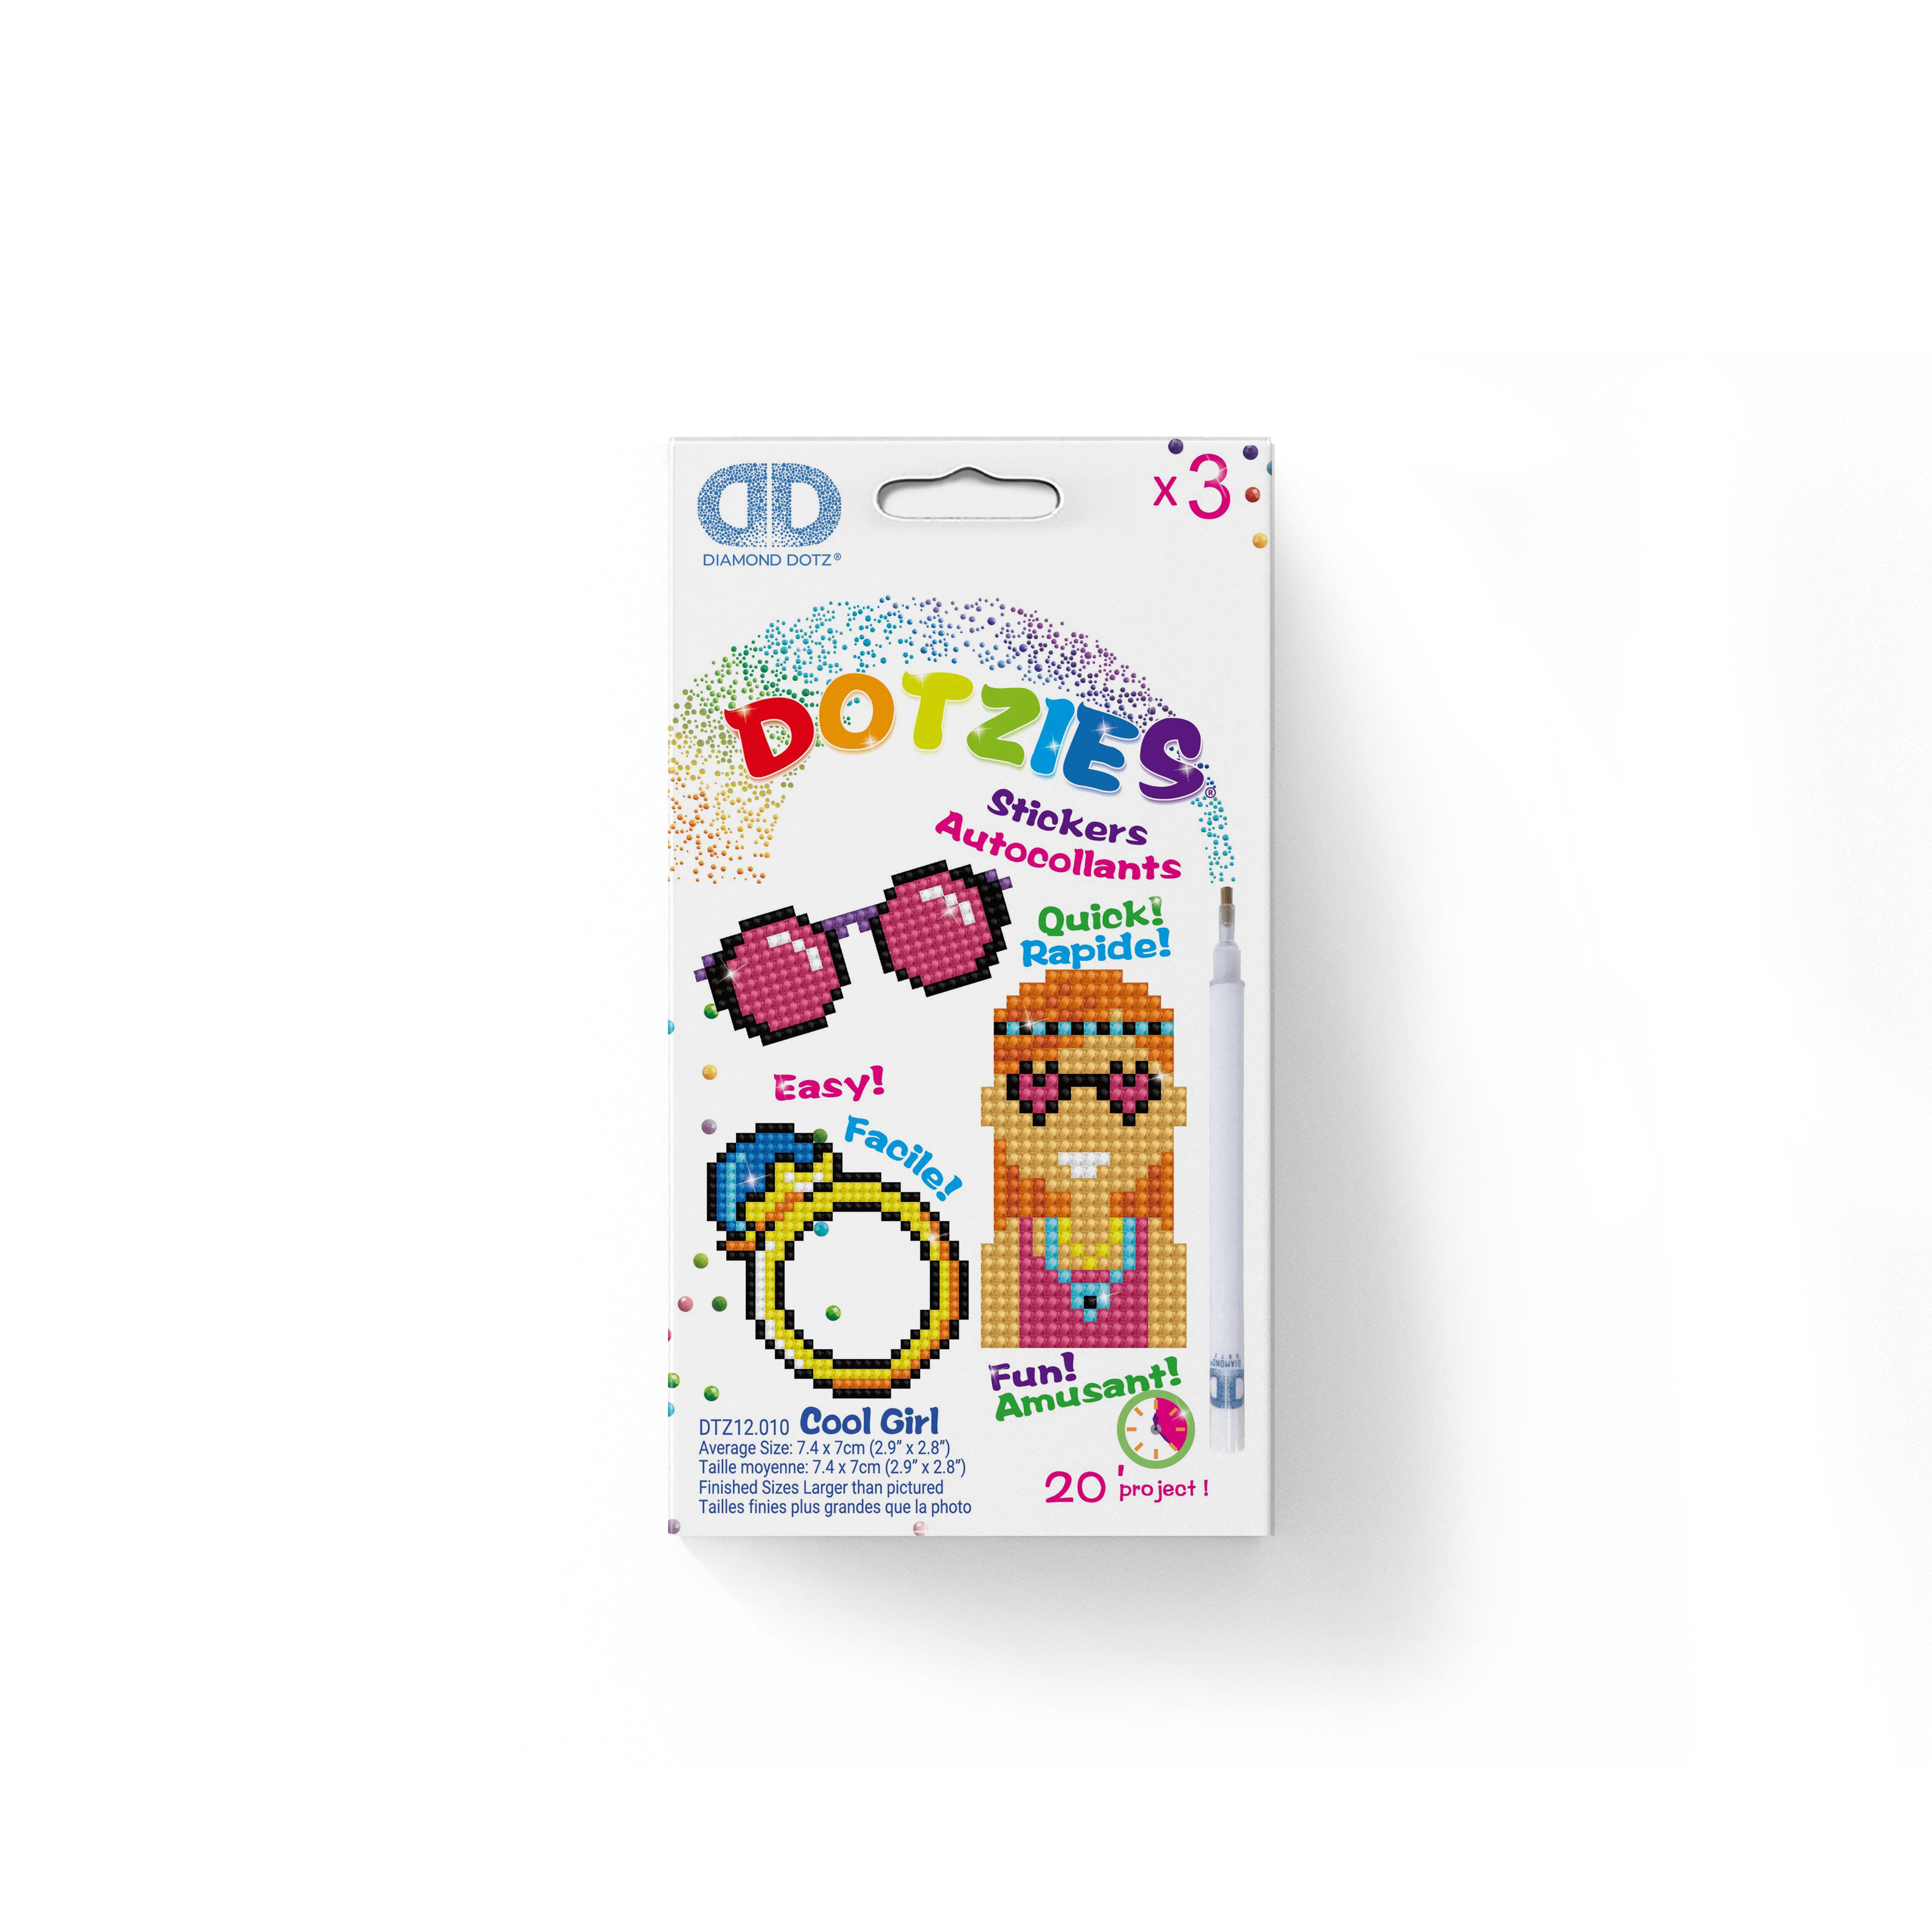 DTZ12.010_packaging